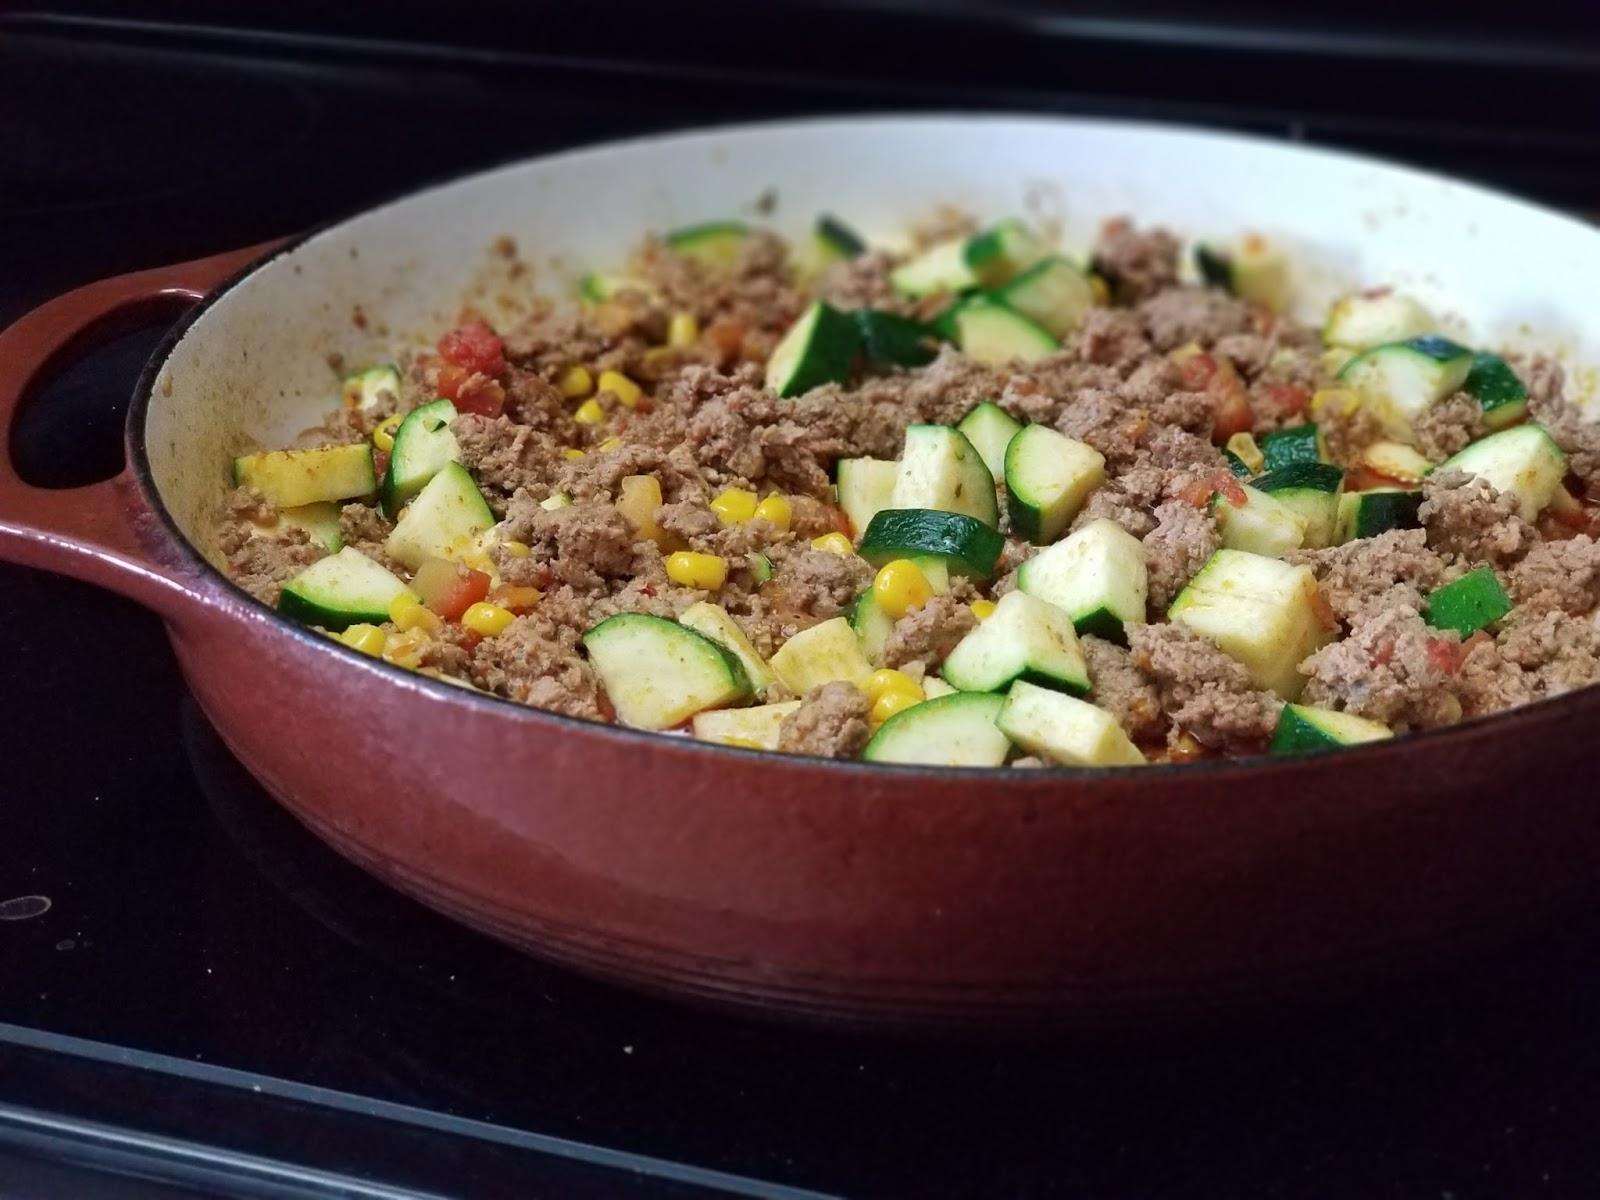 Zucchini and Turkey Skillet